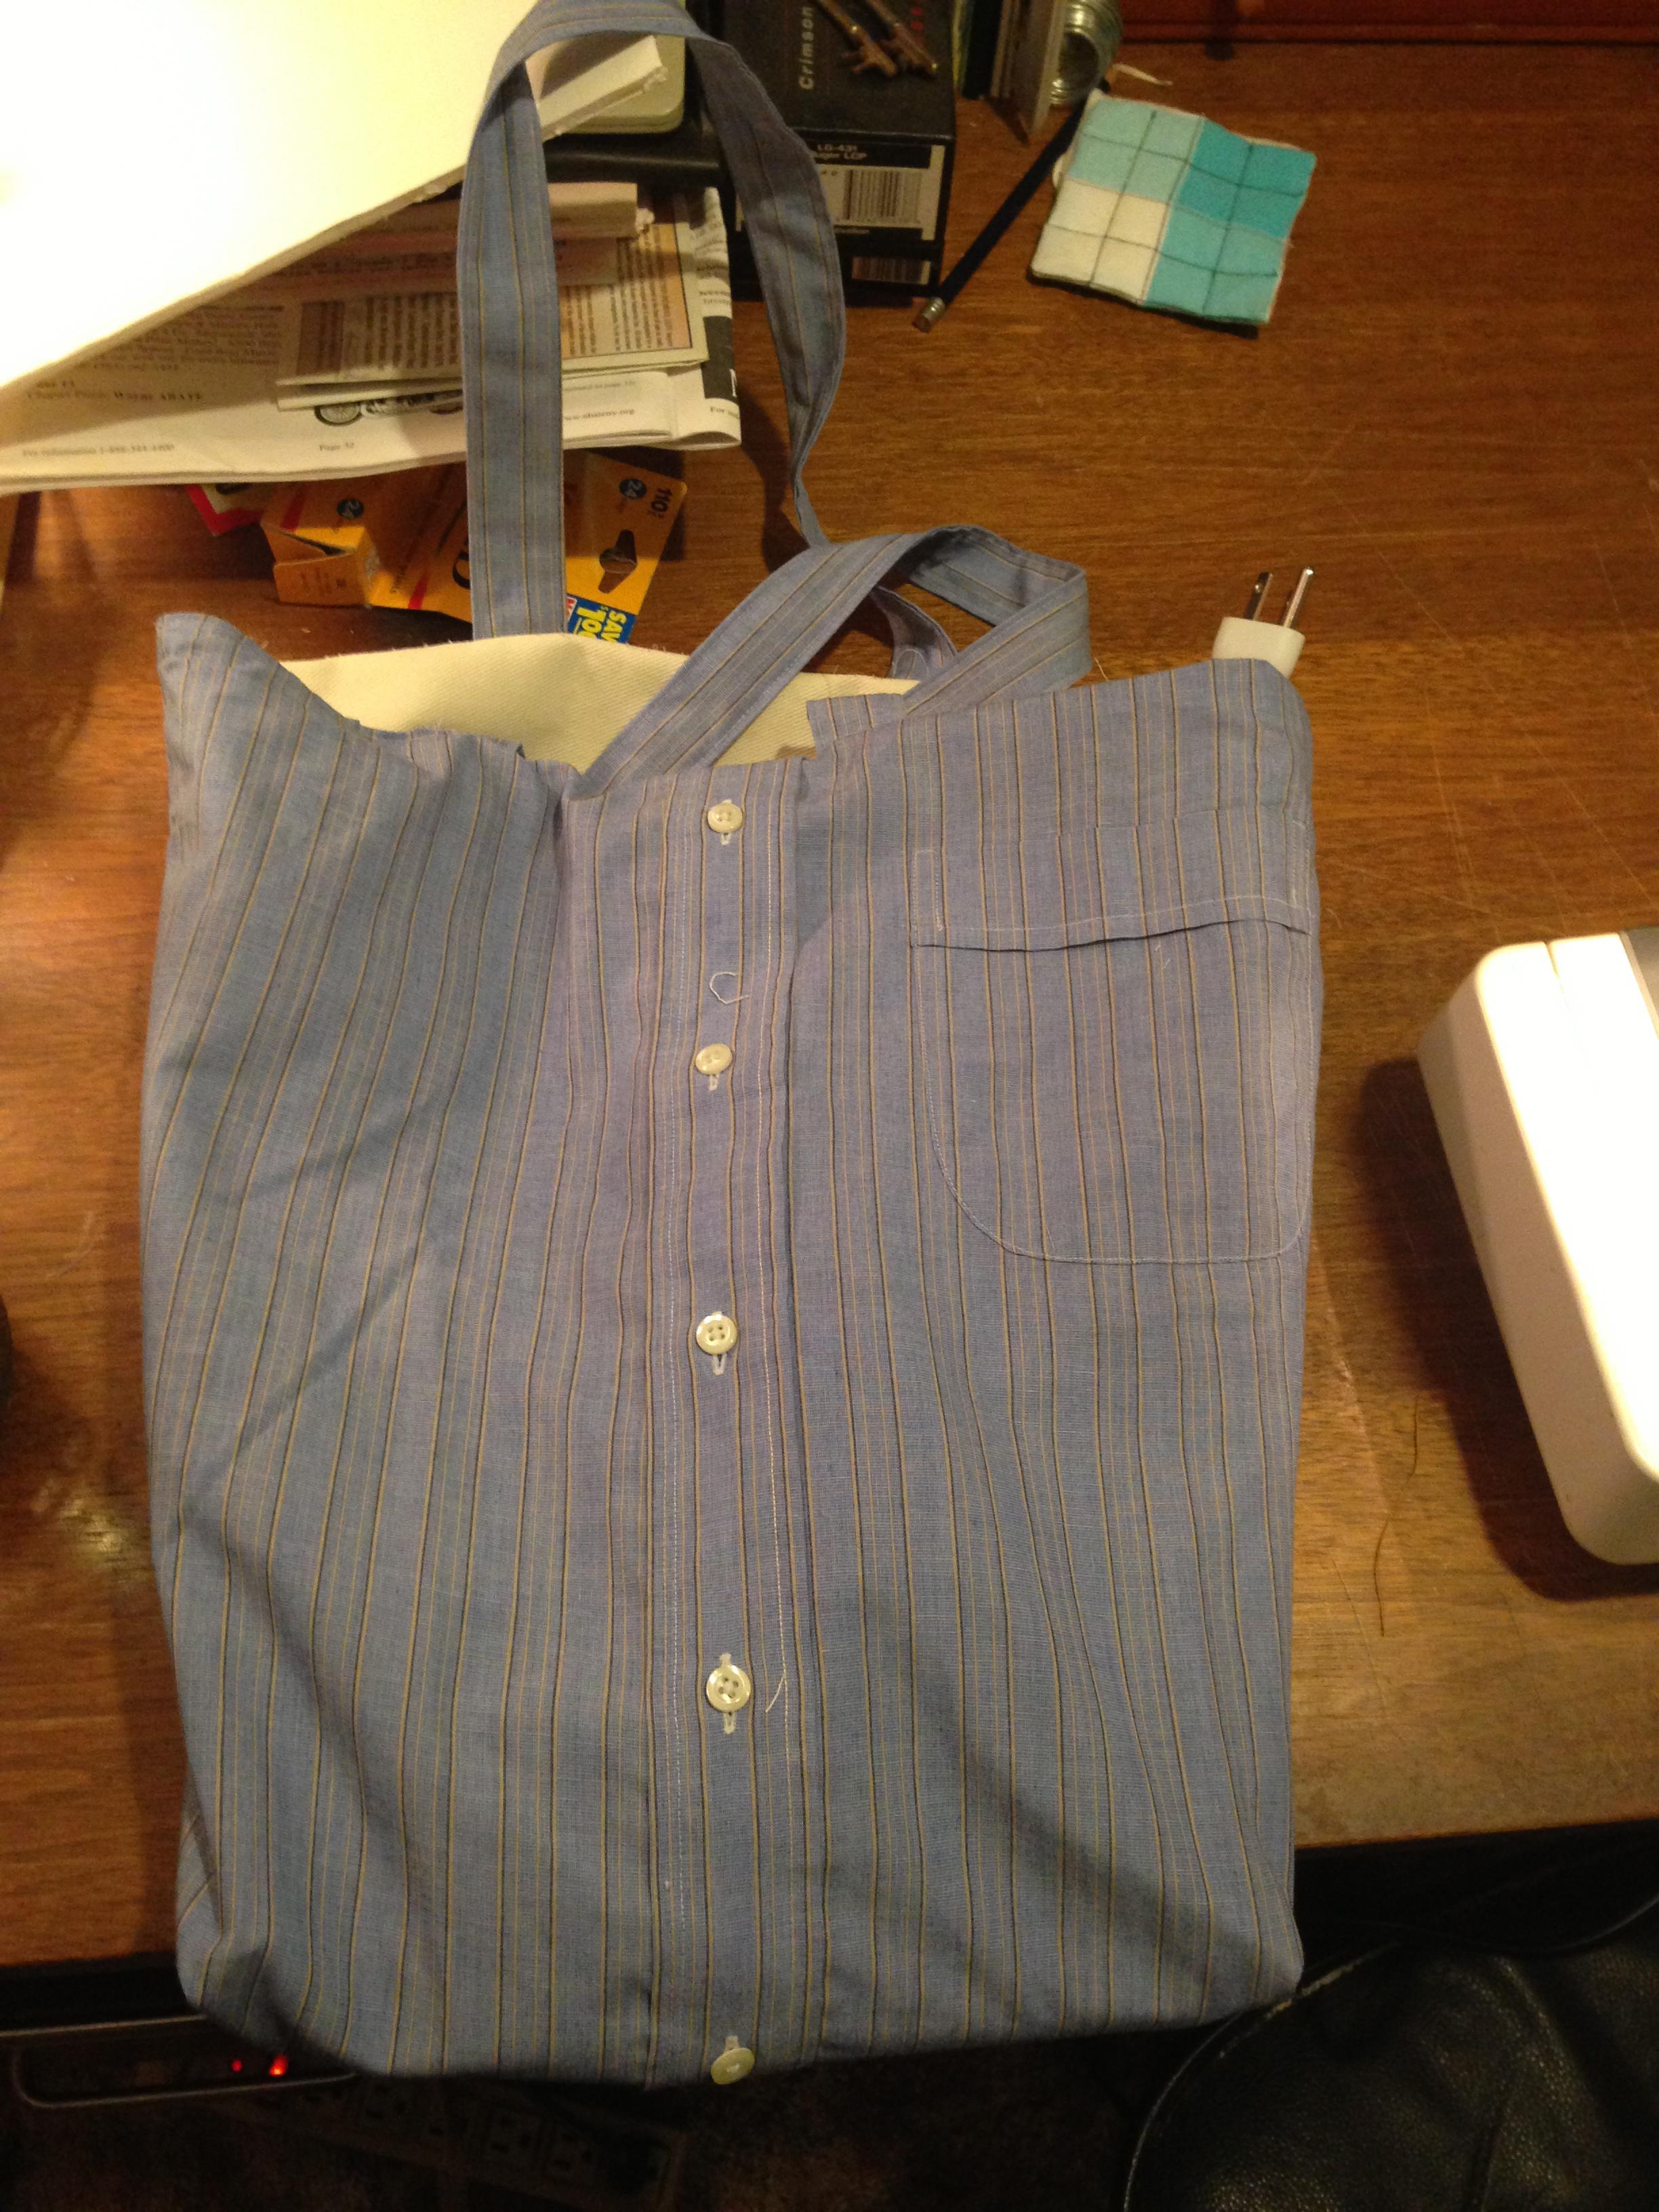 Upcycled Shirt Tote